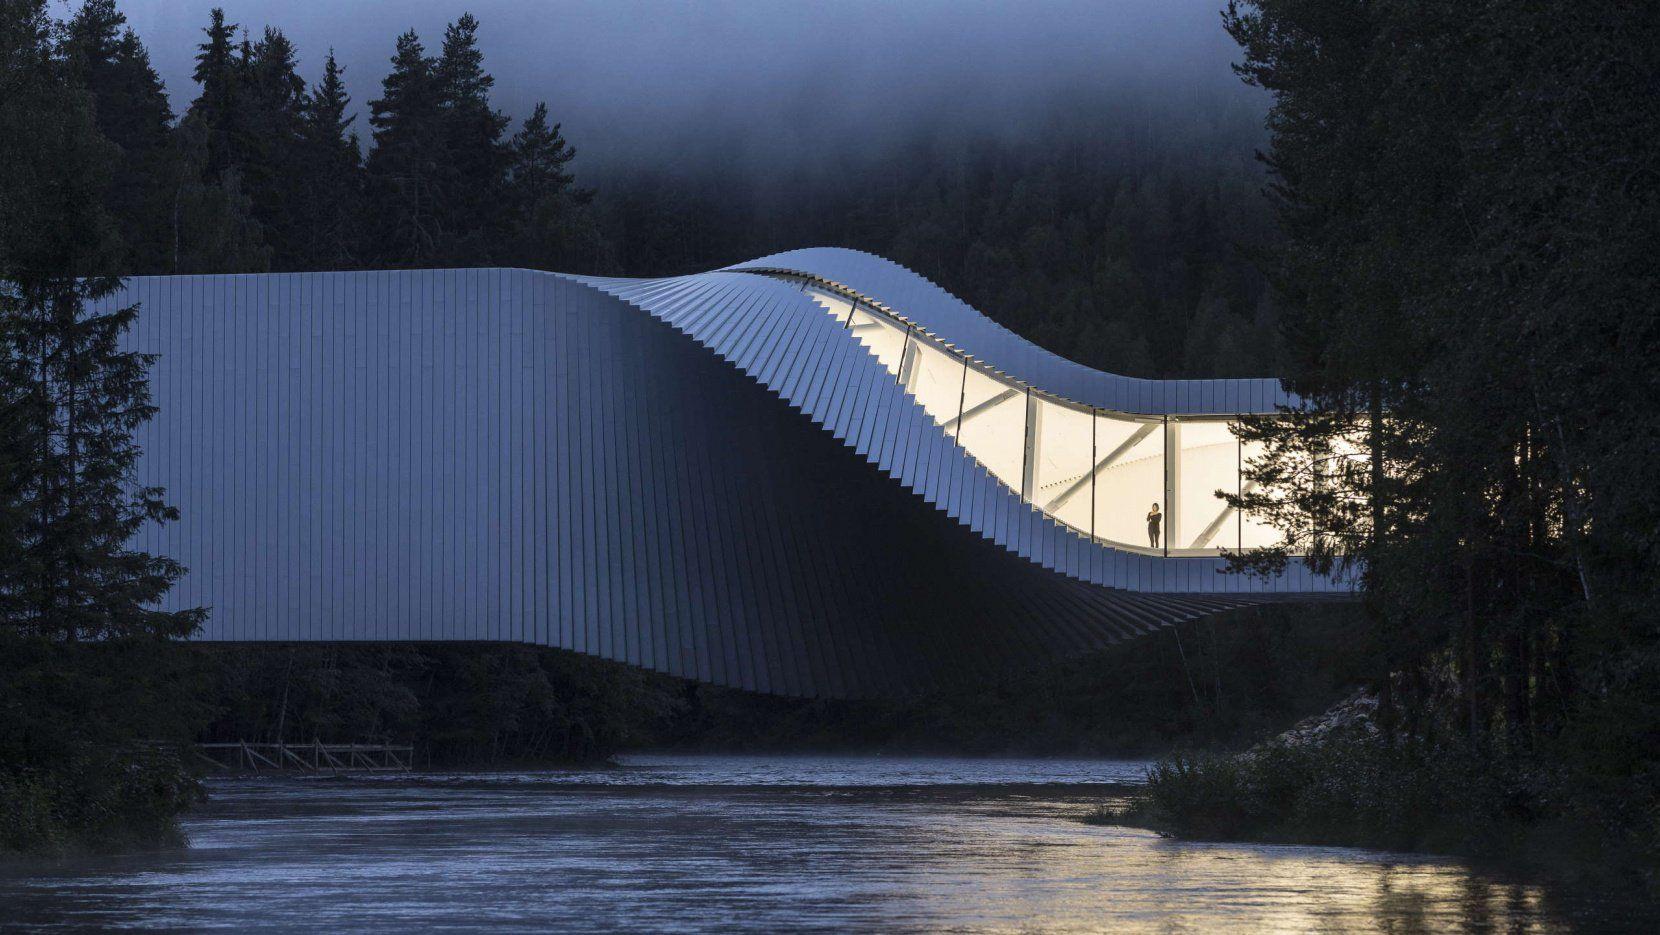 Design Bank Twist.Architecture With A Twist Big S Sculptural Bridge In The